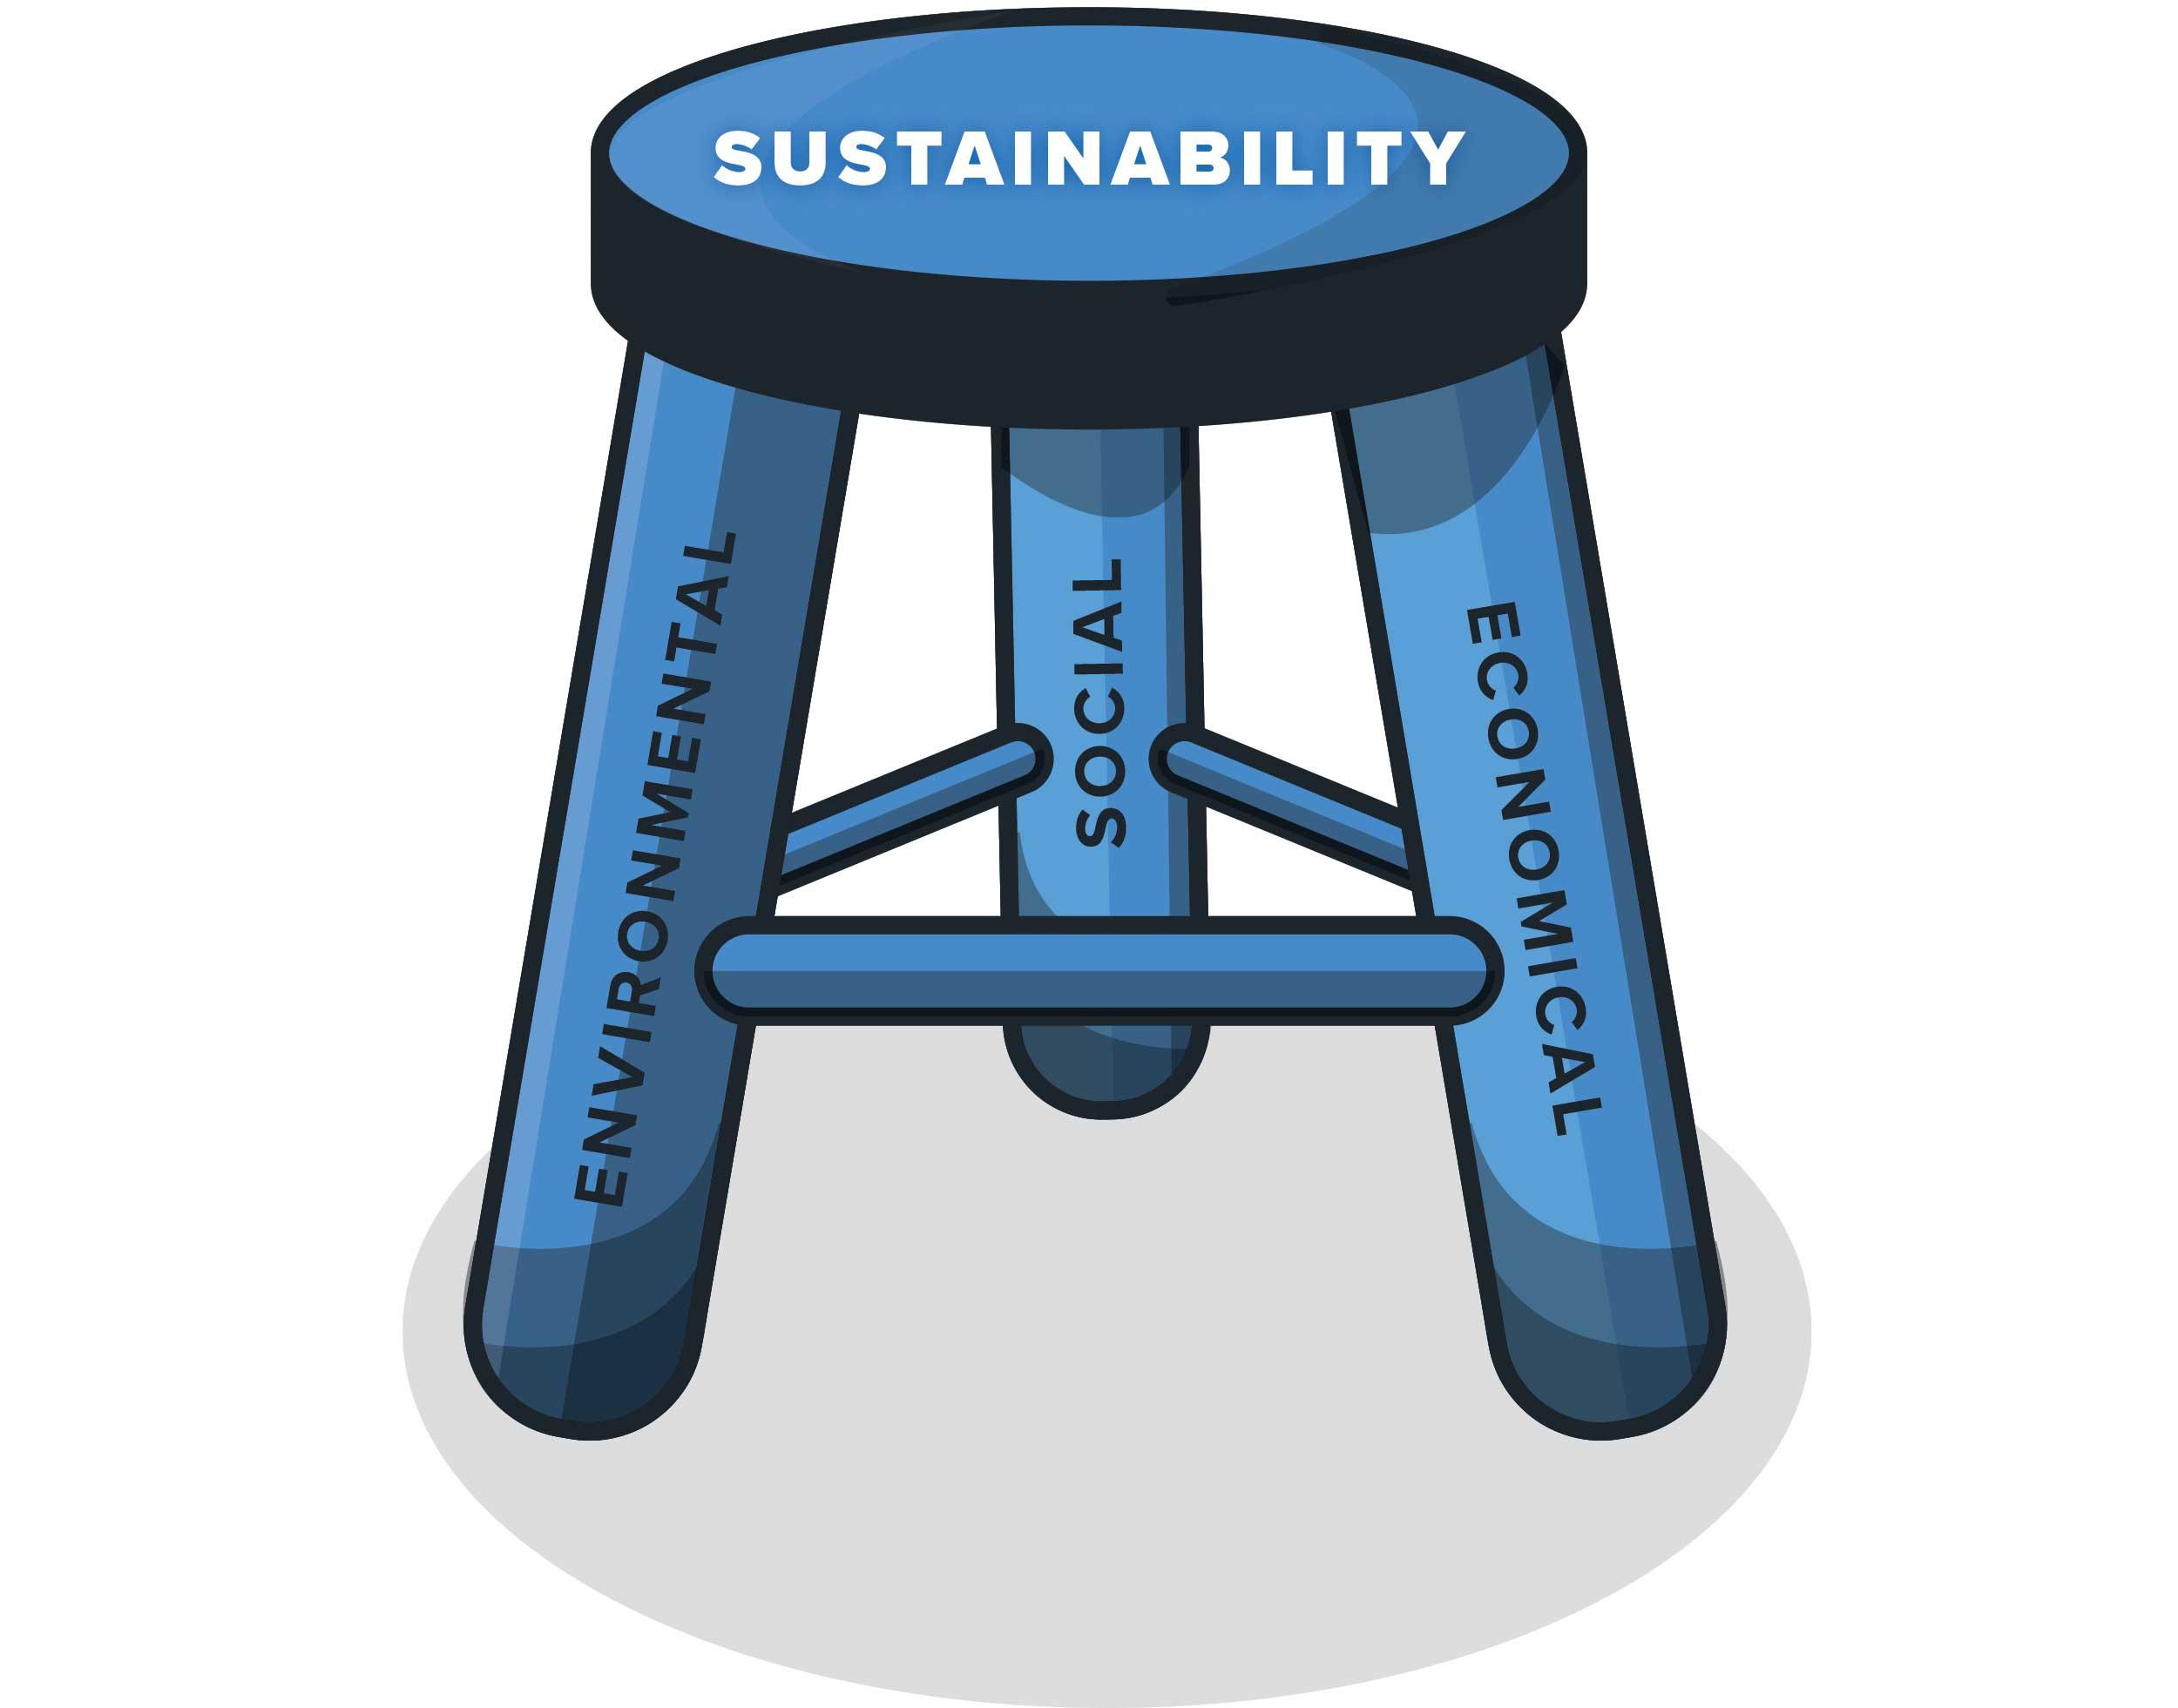 Sustainability as a Three-Legged Stool: Environmental, Economical and Social Factors Make Up Sustainability | Woodruff